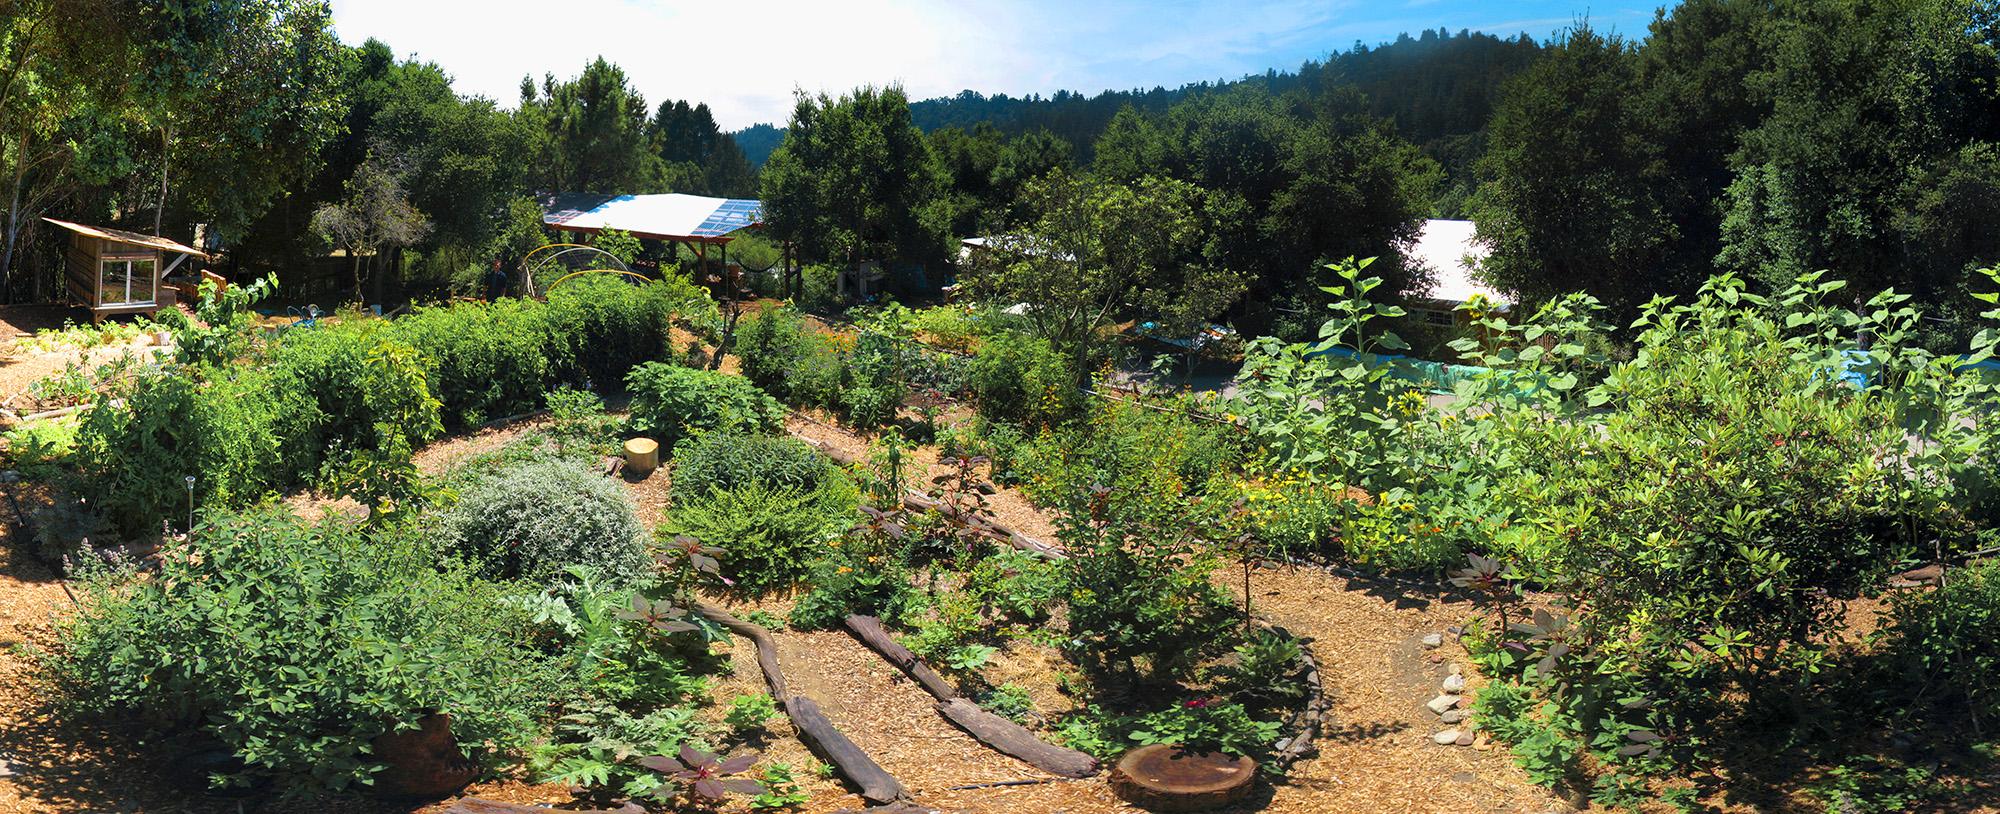 hight resolution of garden panorama crop isaiah cave workin